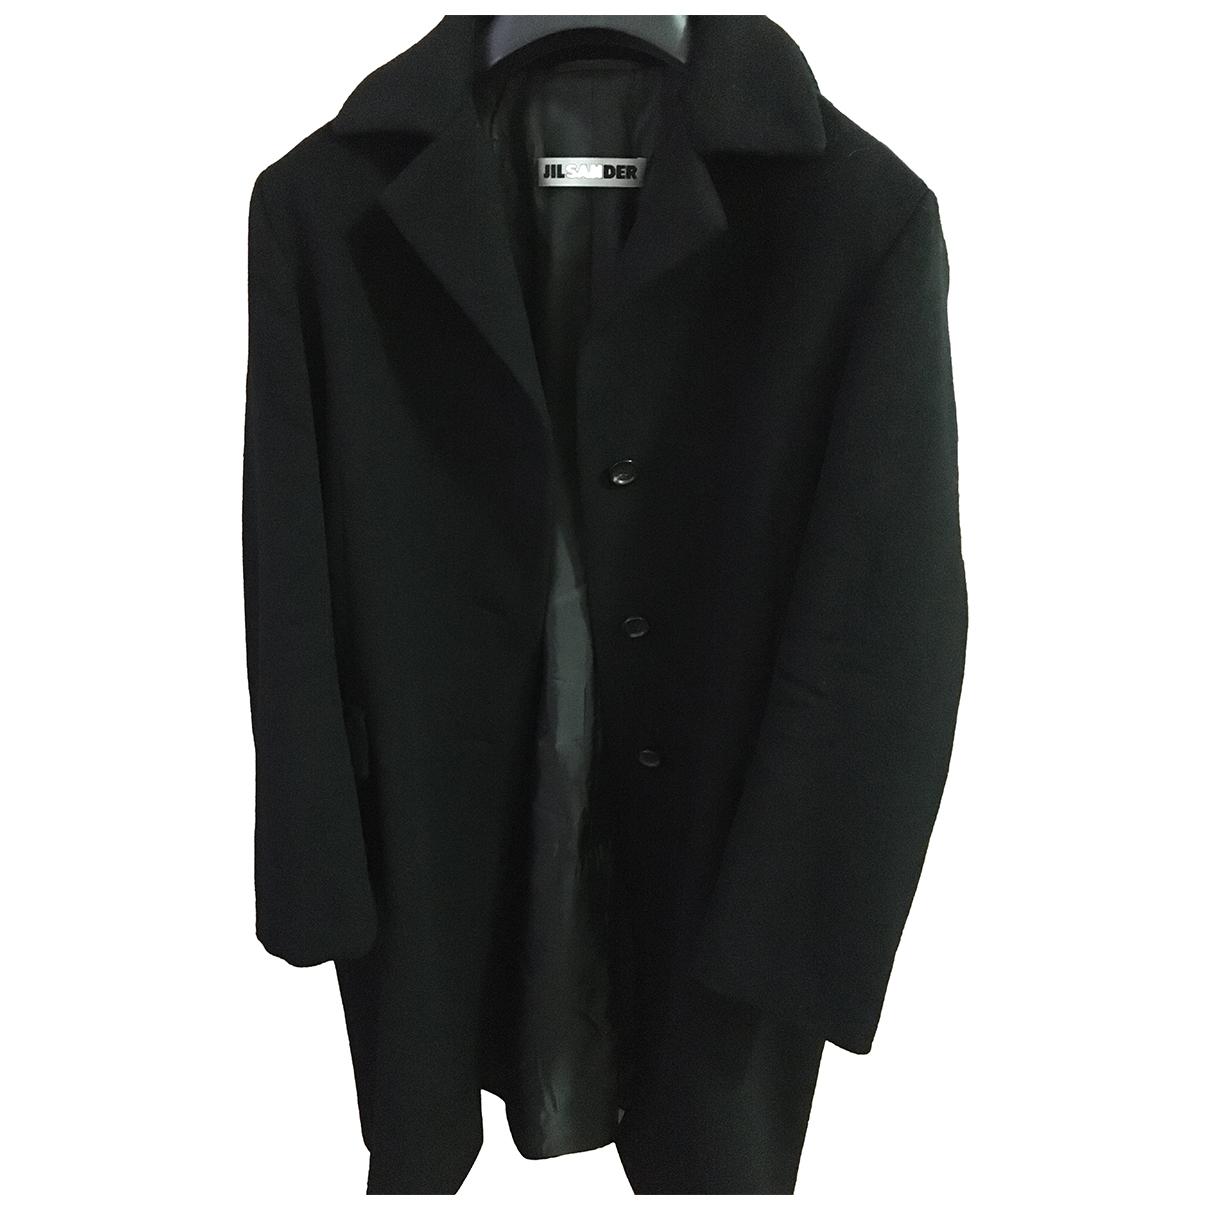 Jil Sander \N Black Cashmere coat for Women 40 IT